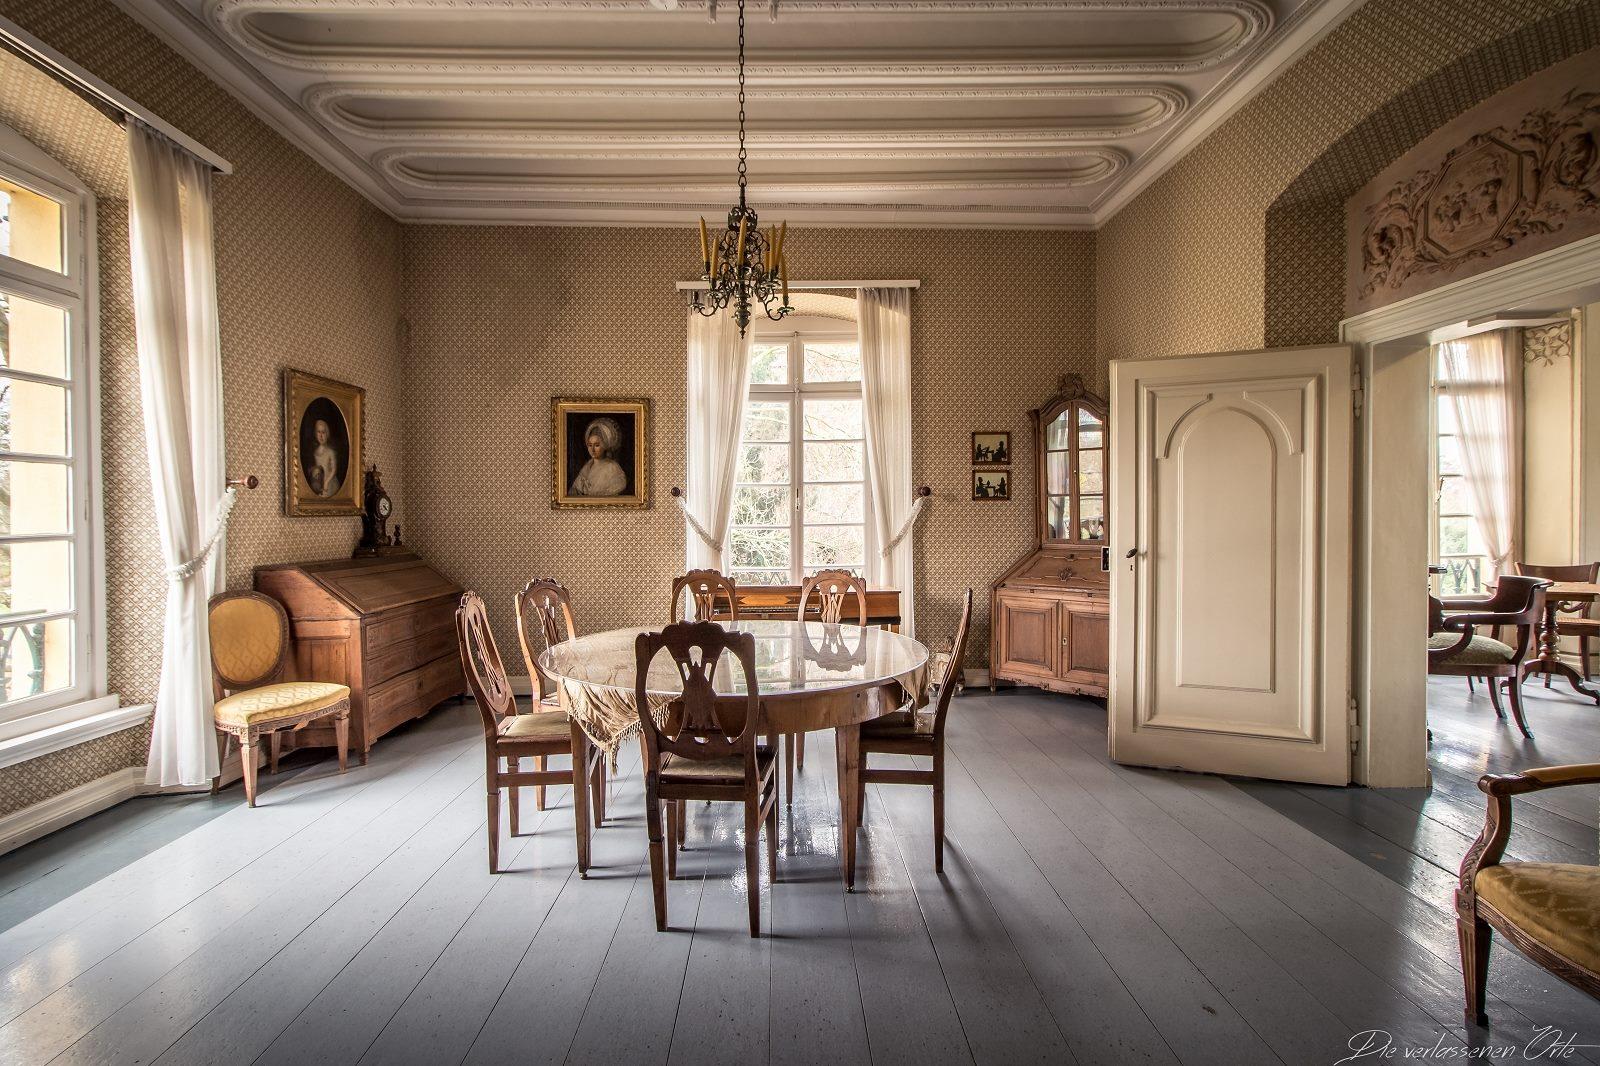 Maison de la Chassee – Die verlassenen Orte